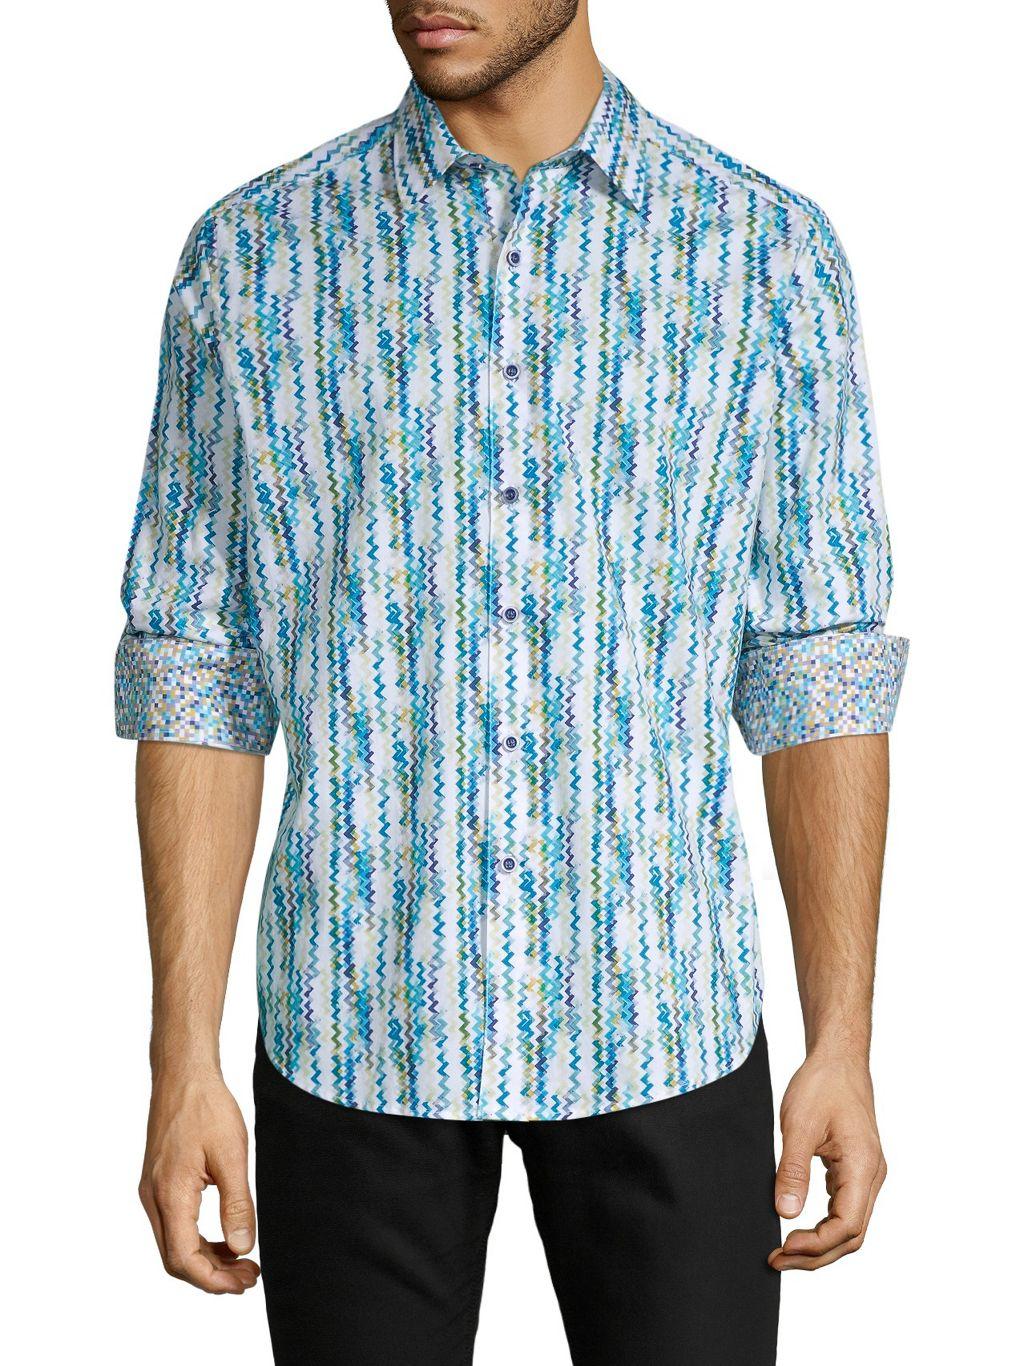 Robert Graham Classic-Fit Chevron Long Sleeve Shirt